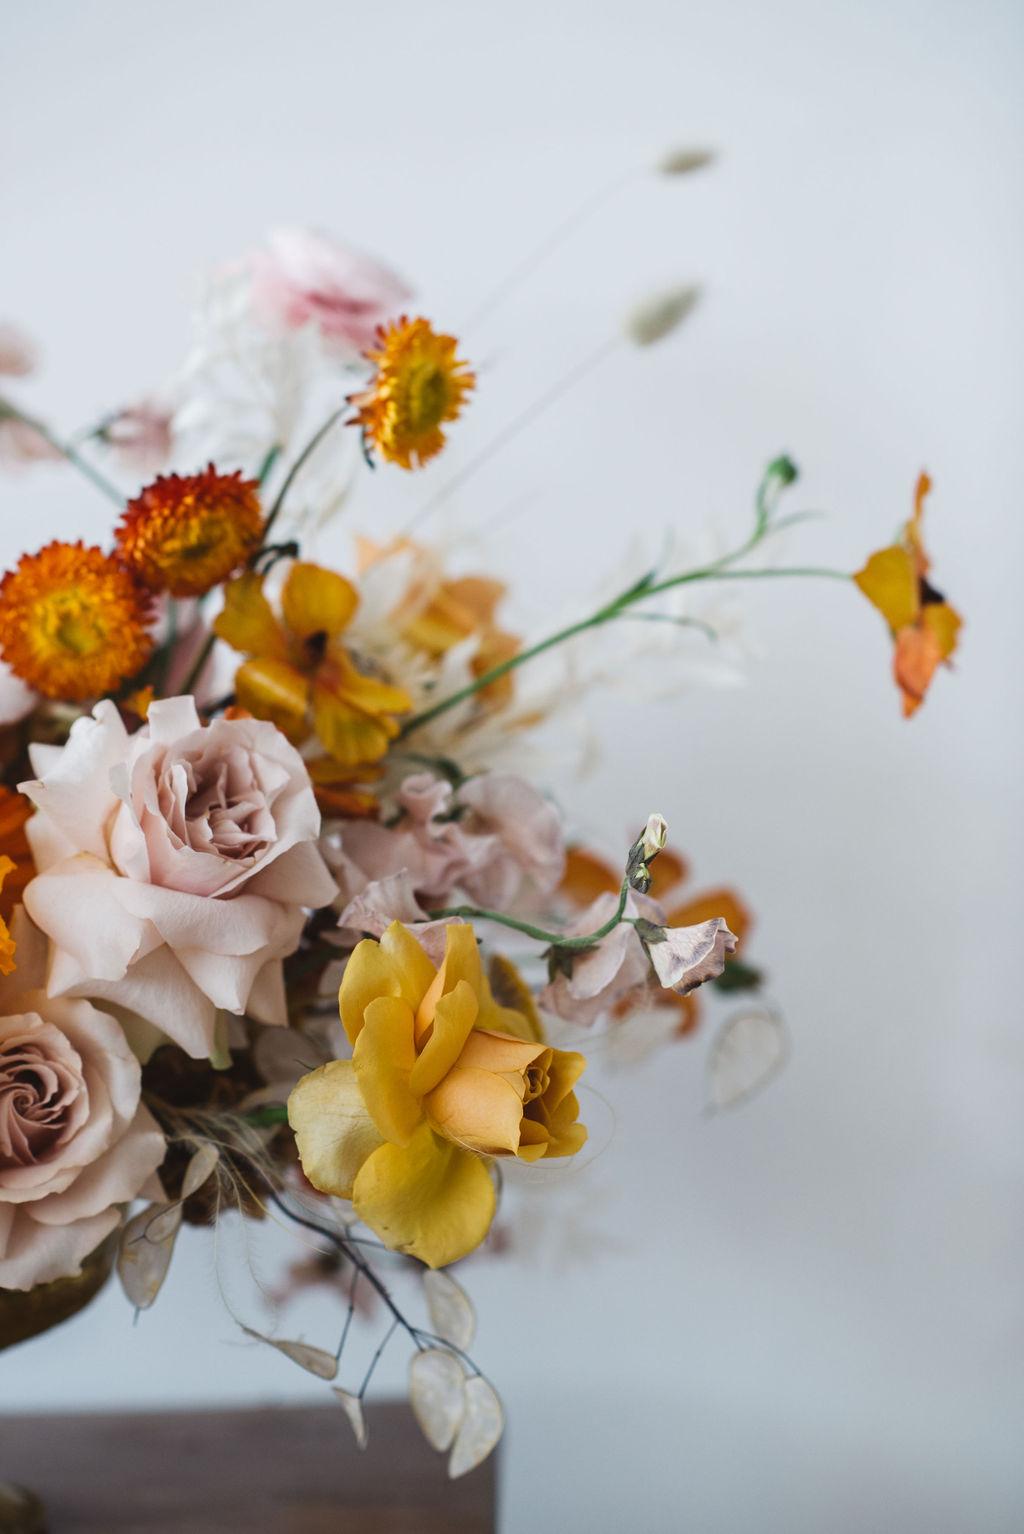 modern wedding centre piece - yellow roses